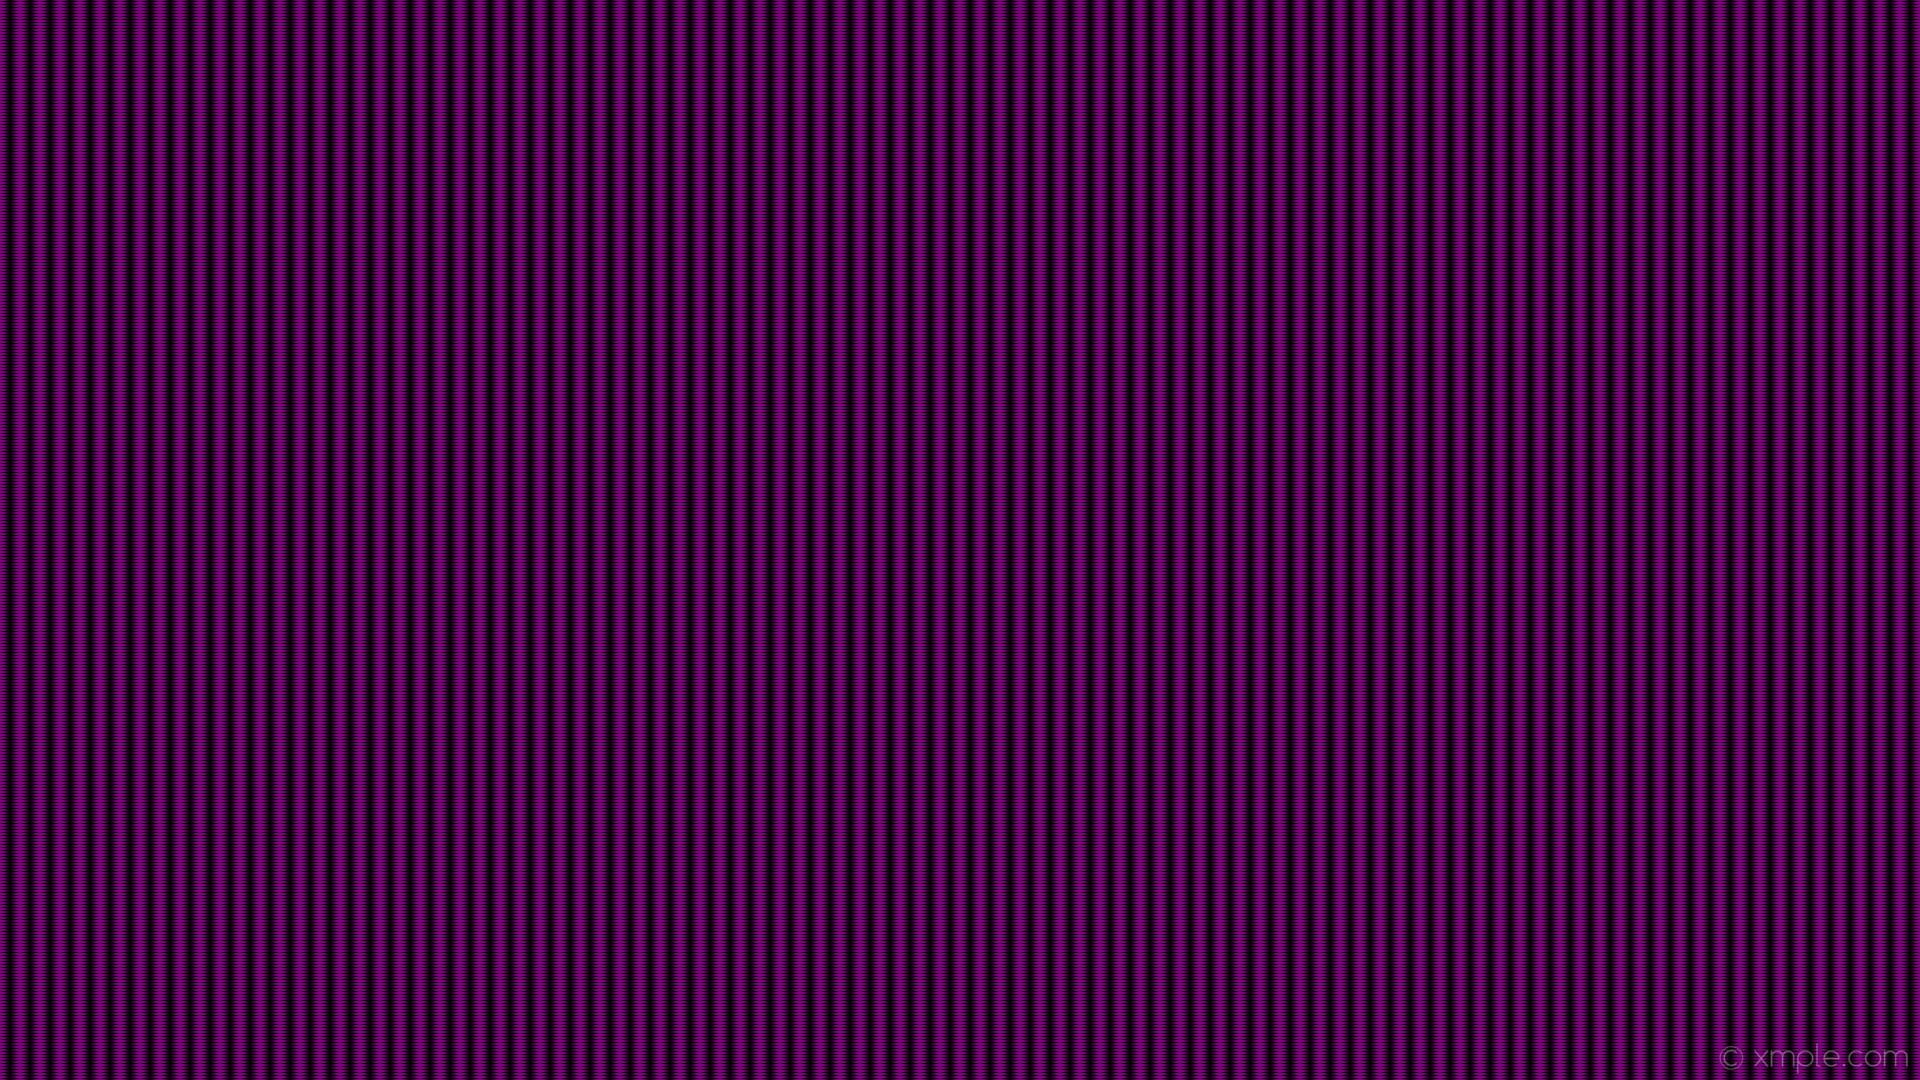 wallpaper lozenge black rhombus diamond purple #800080 #000000 0° 20px 3px